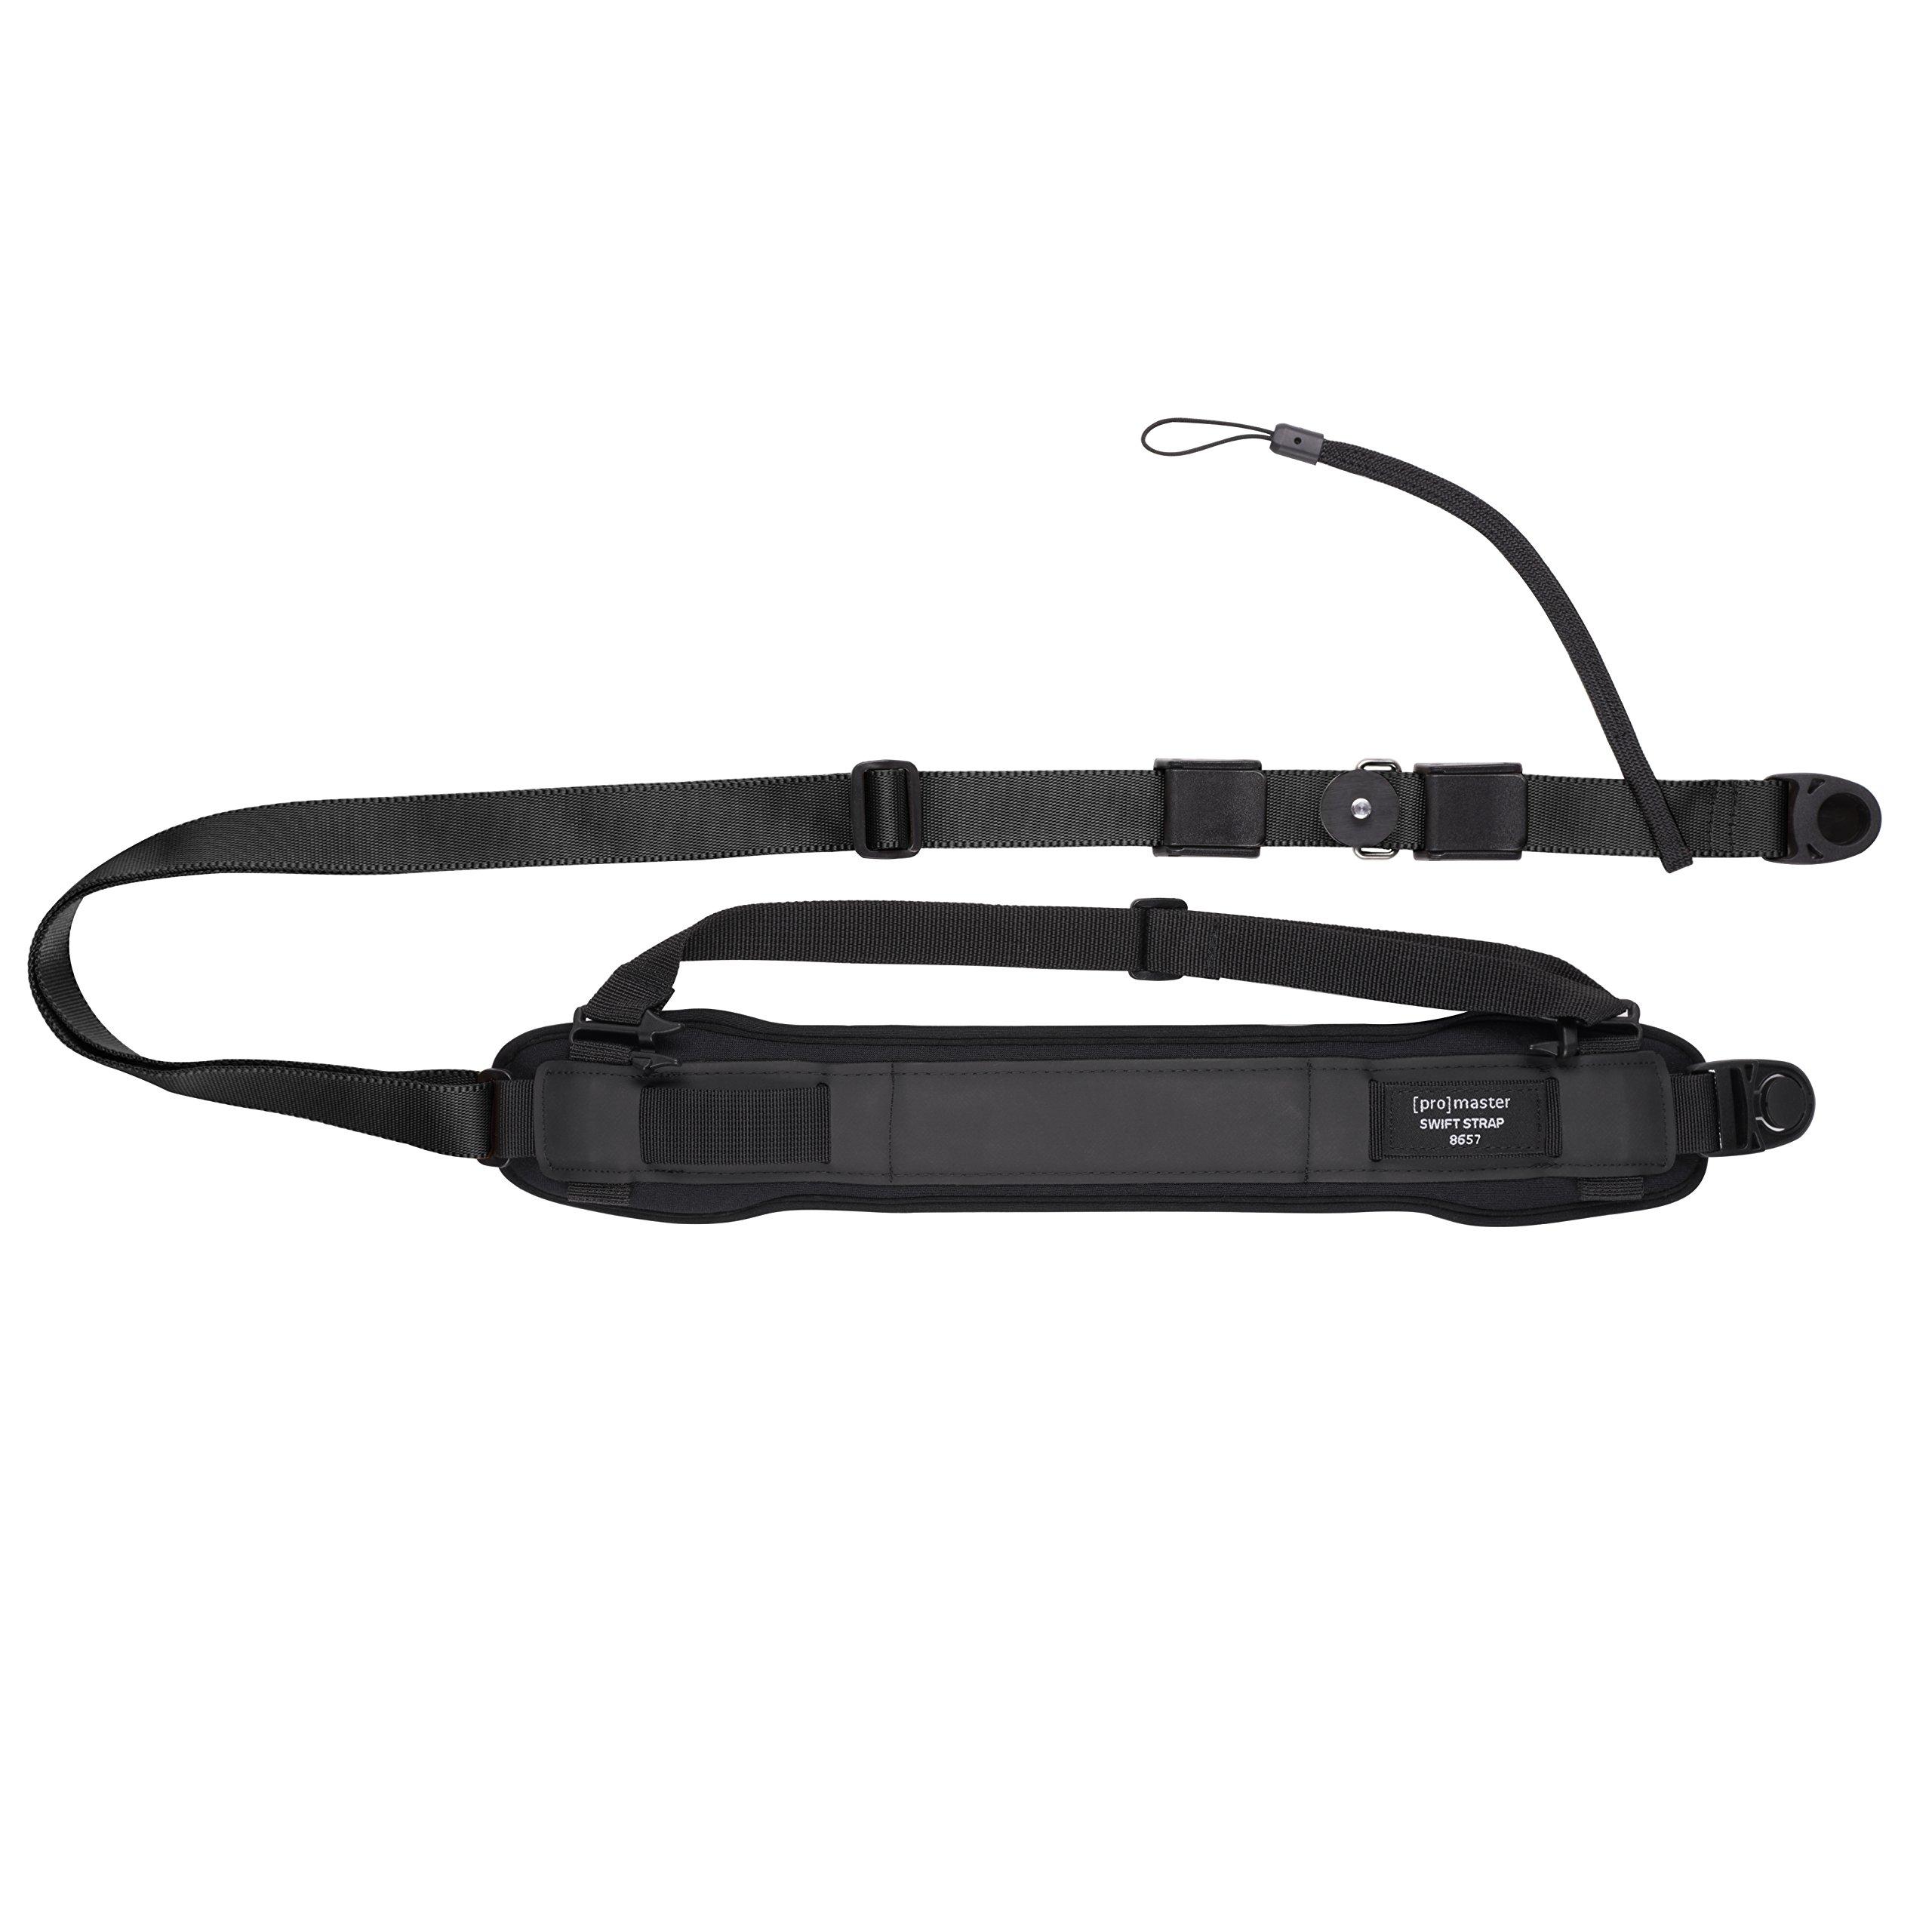 Promaster Swift Strap 2 HD for Professional DSLR - Black